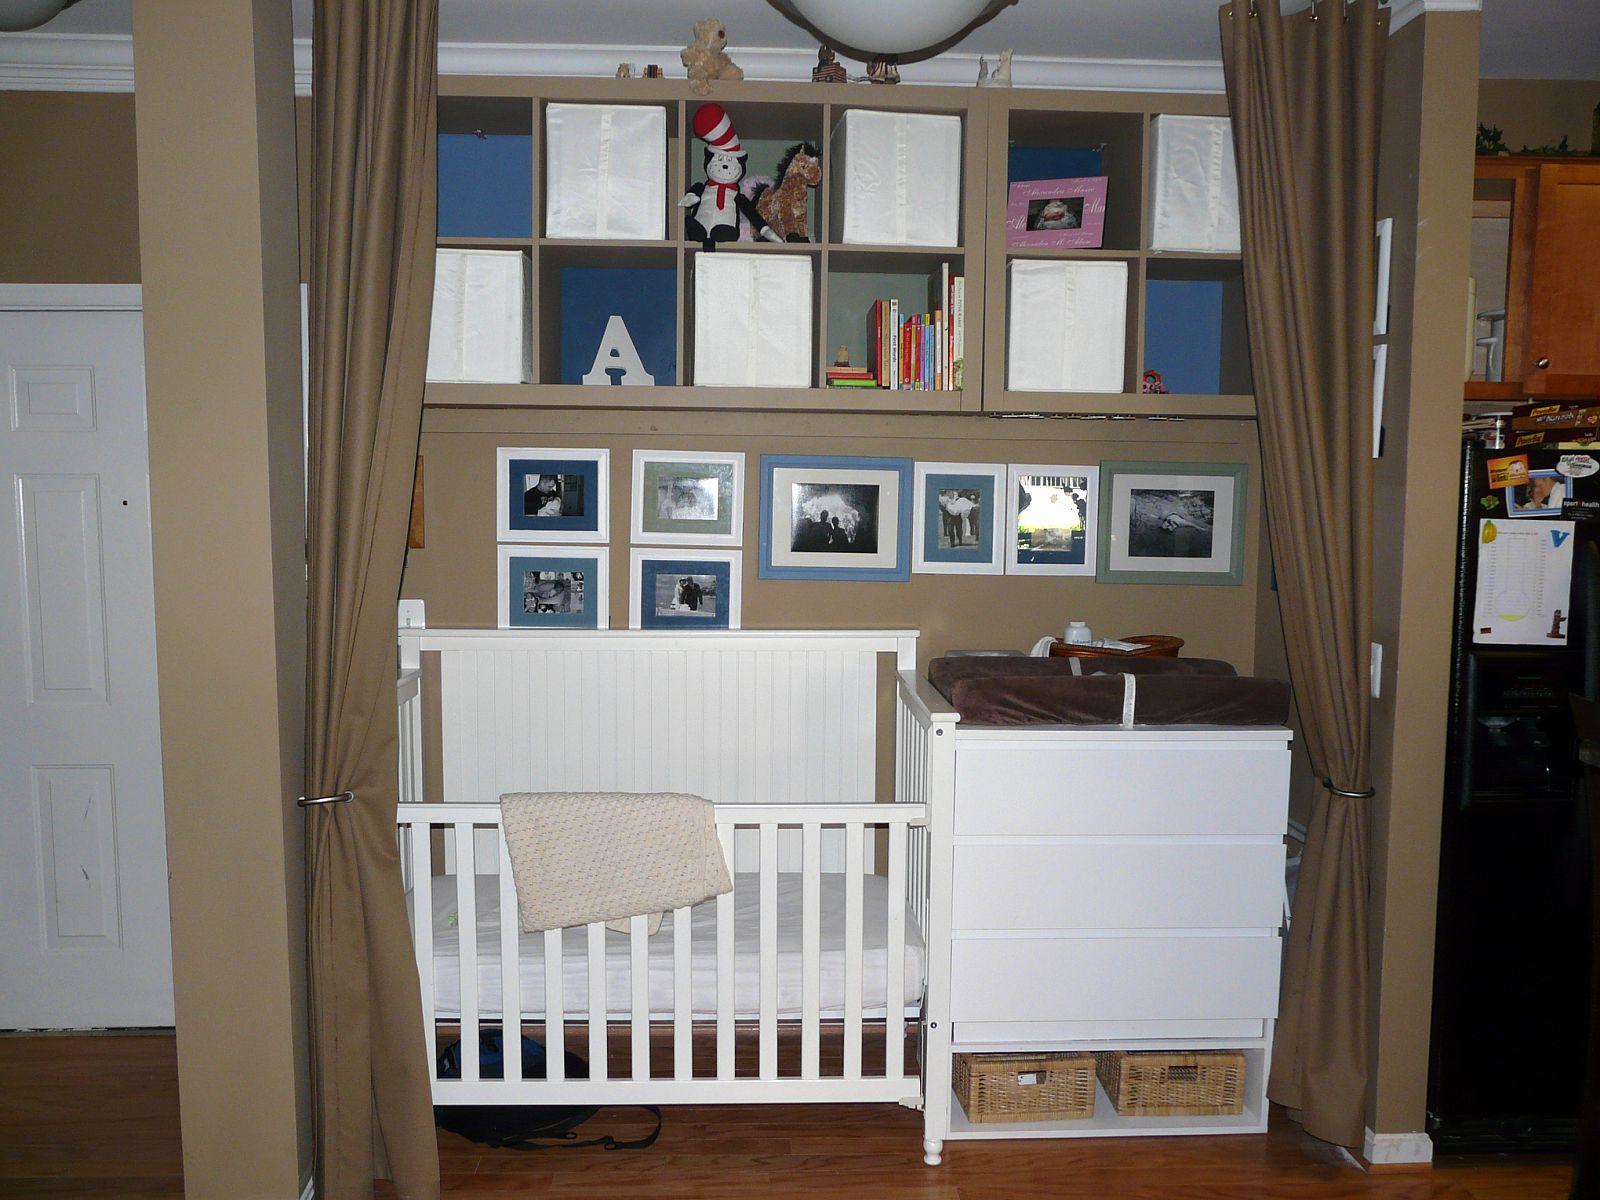 A baby room with ikea hacksIKEA HackersIKEA Hackers